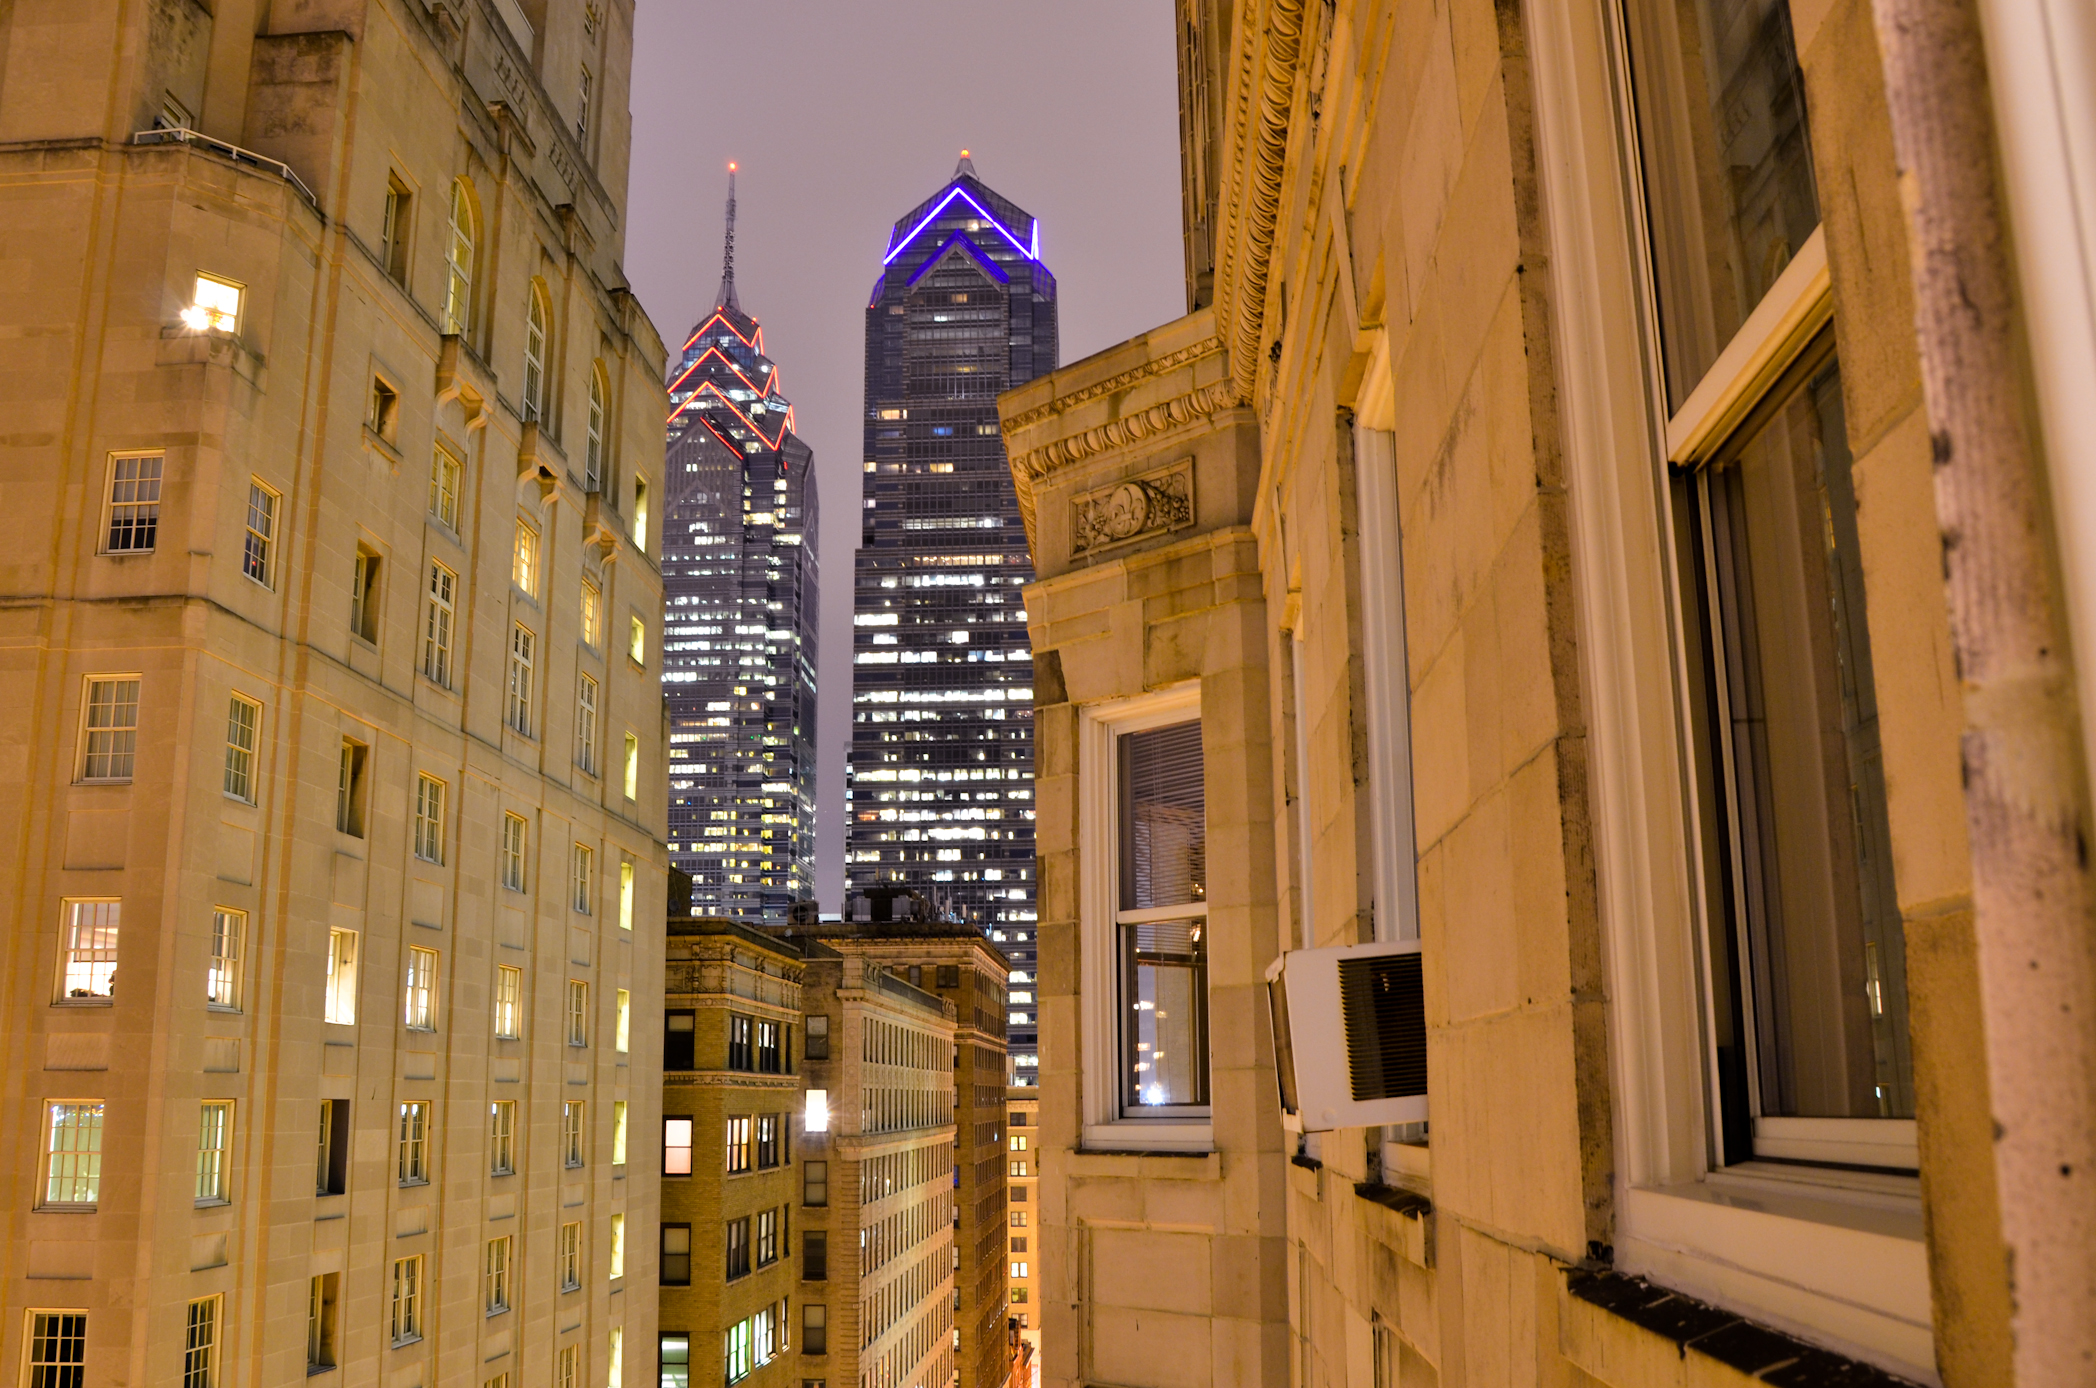 Philadelphia Liberty Place One and Two, philly, buildings, architecture, windows, philadelphia skyline, philadelphia at night, center city philadelphia at night, visit philly,